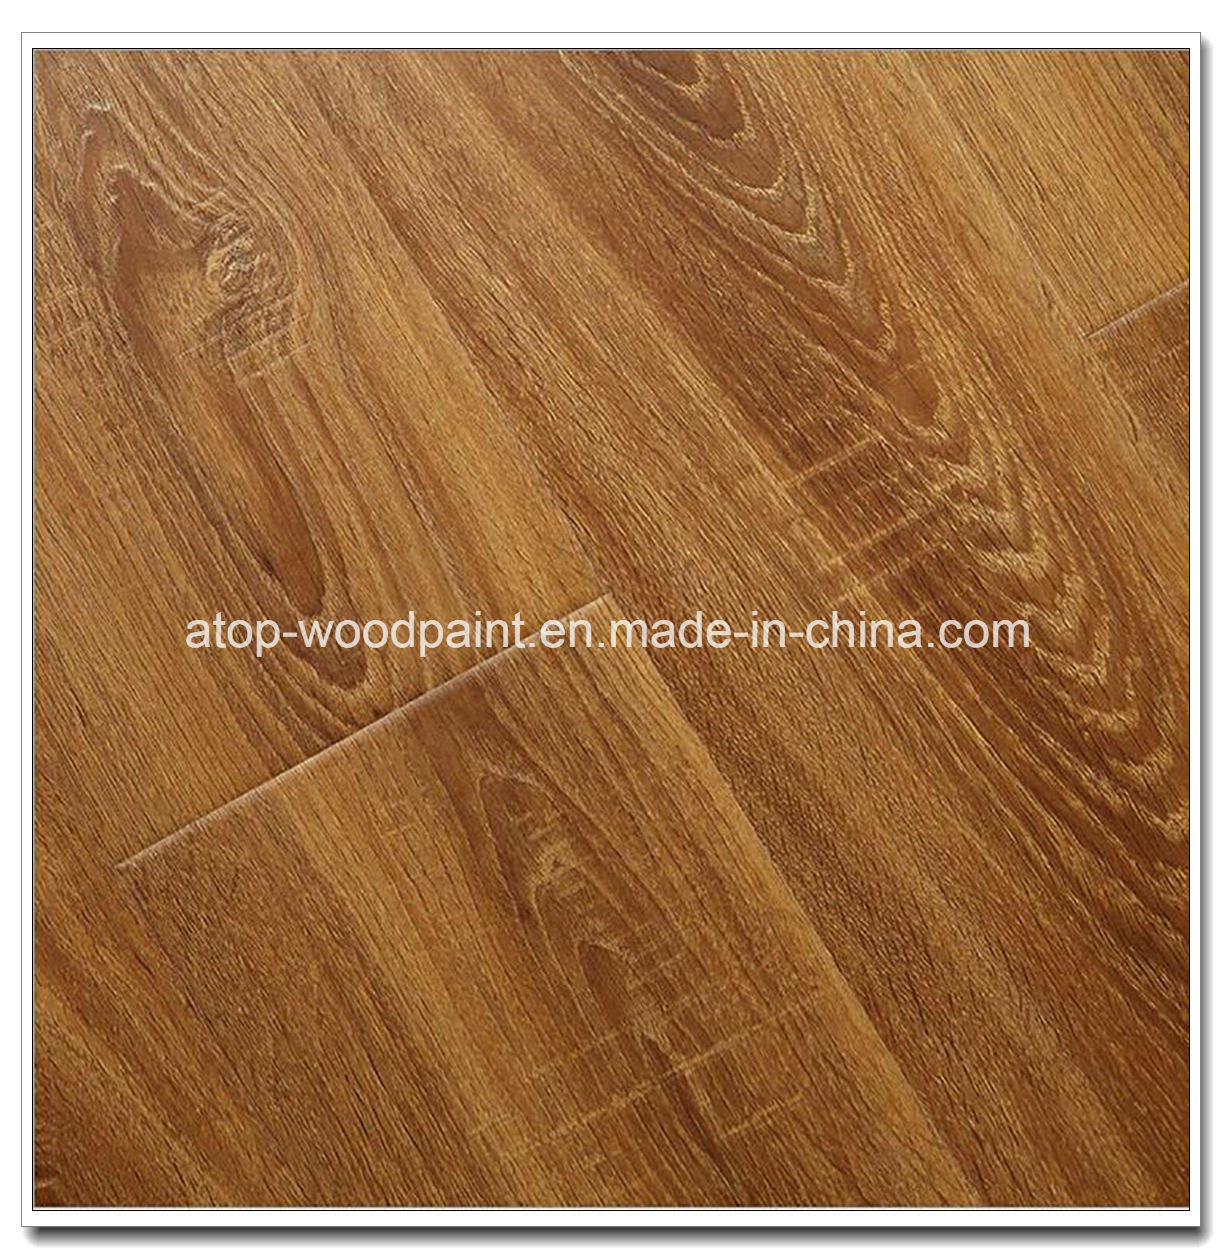 Wood Floor Paint Coating